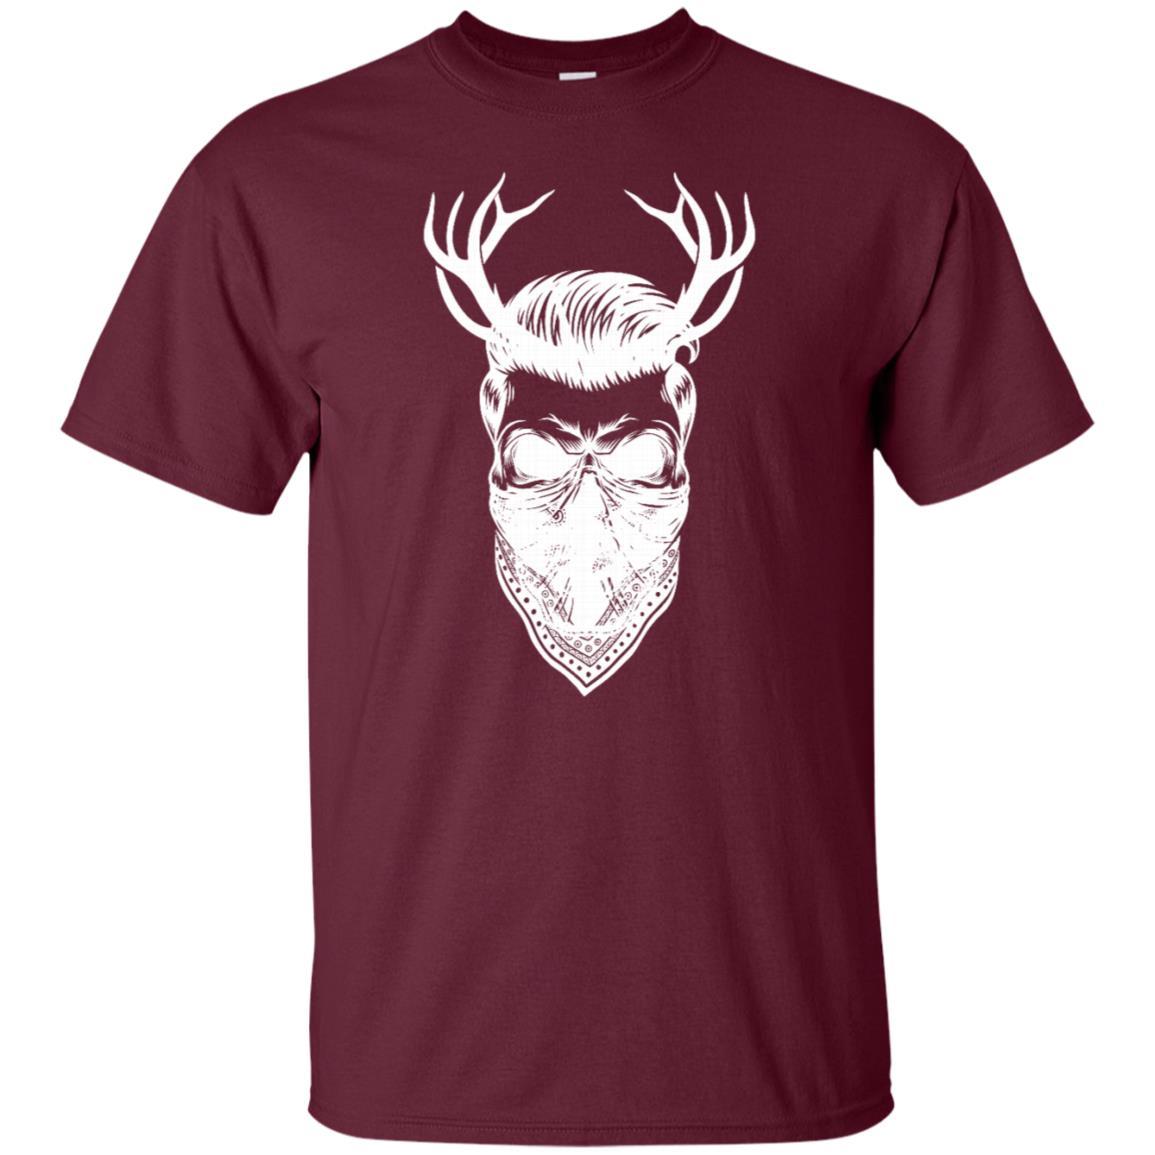 Hipster With Deer Antlers & Bandana Motorcyclist Unisex Short Sleeve